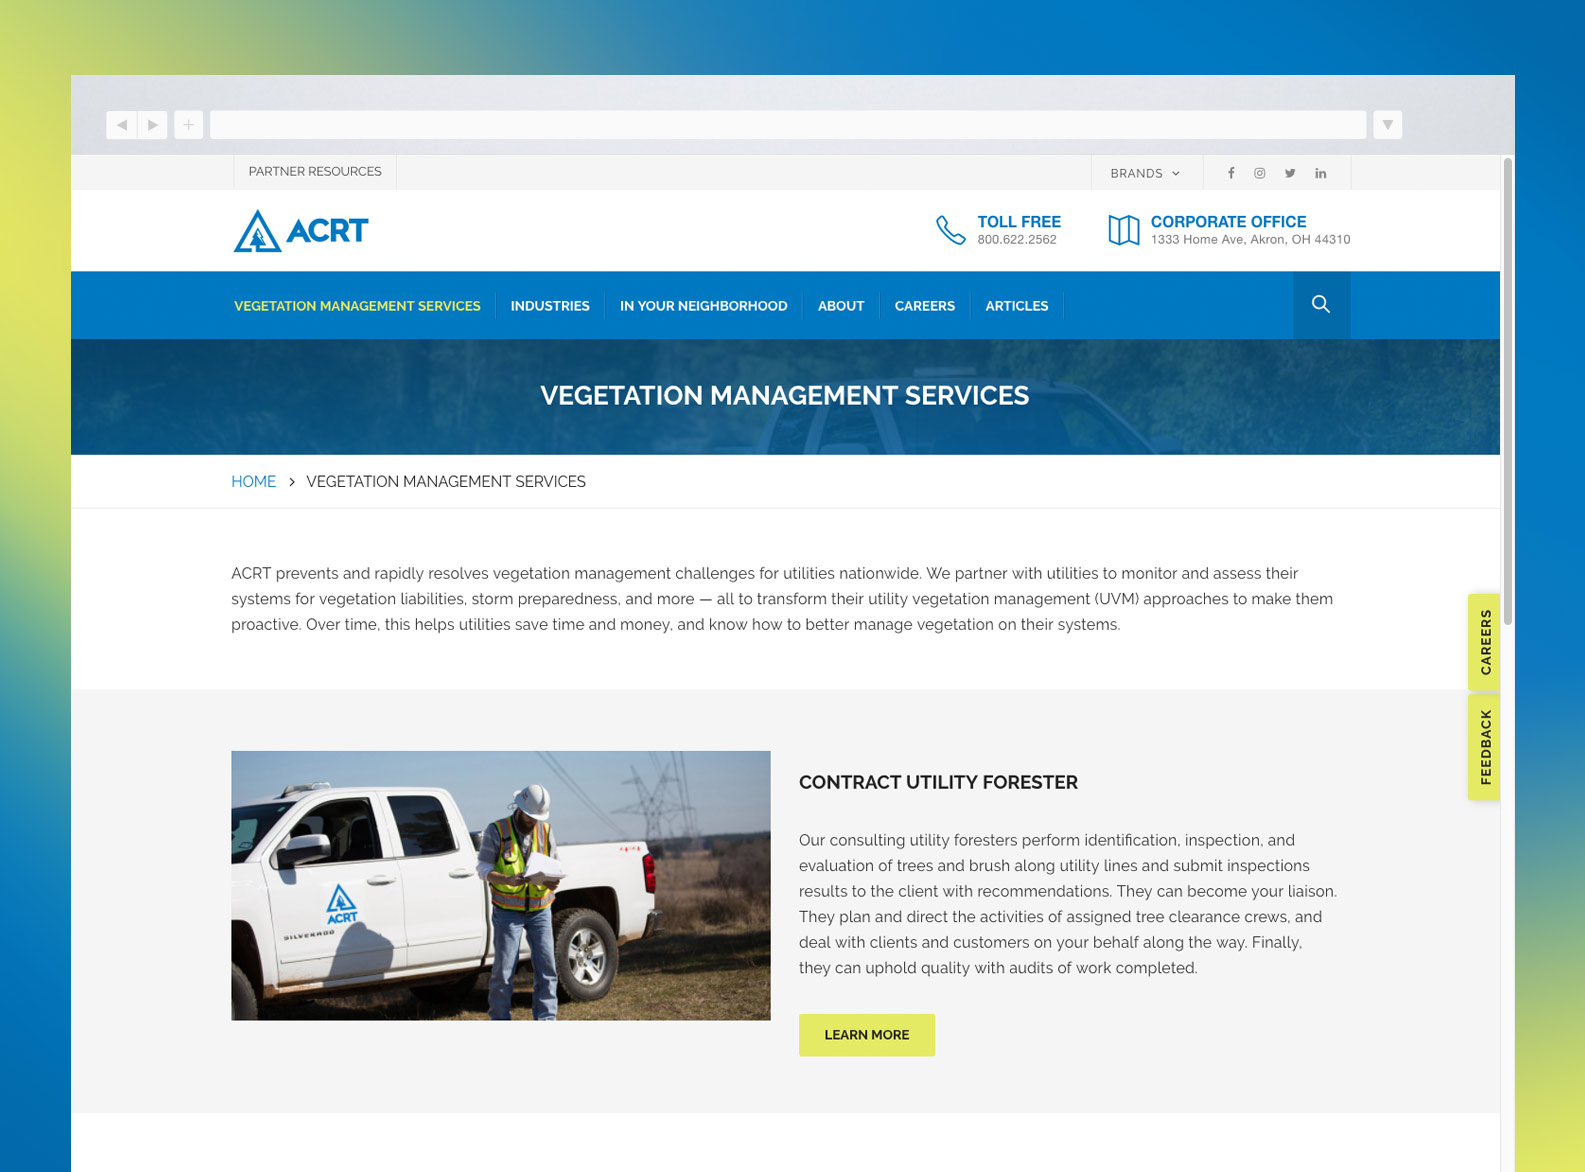 ACRT Services Page